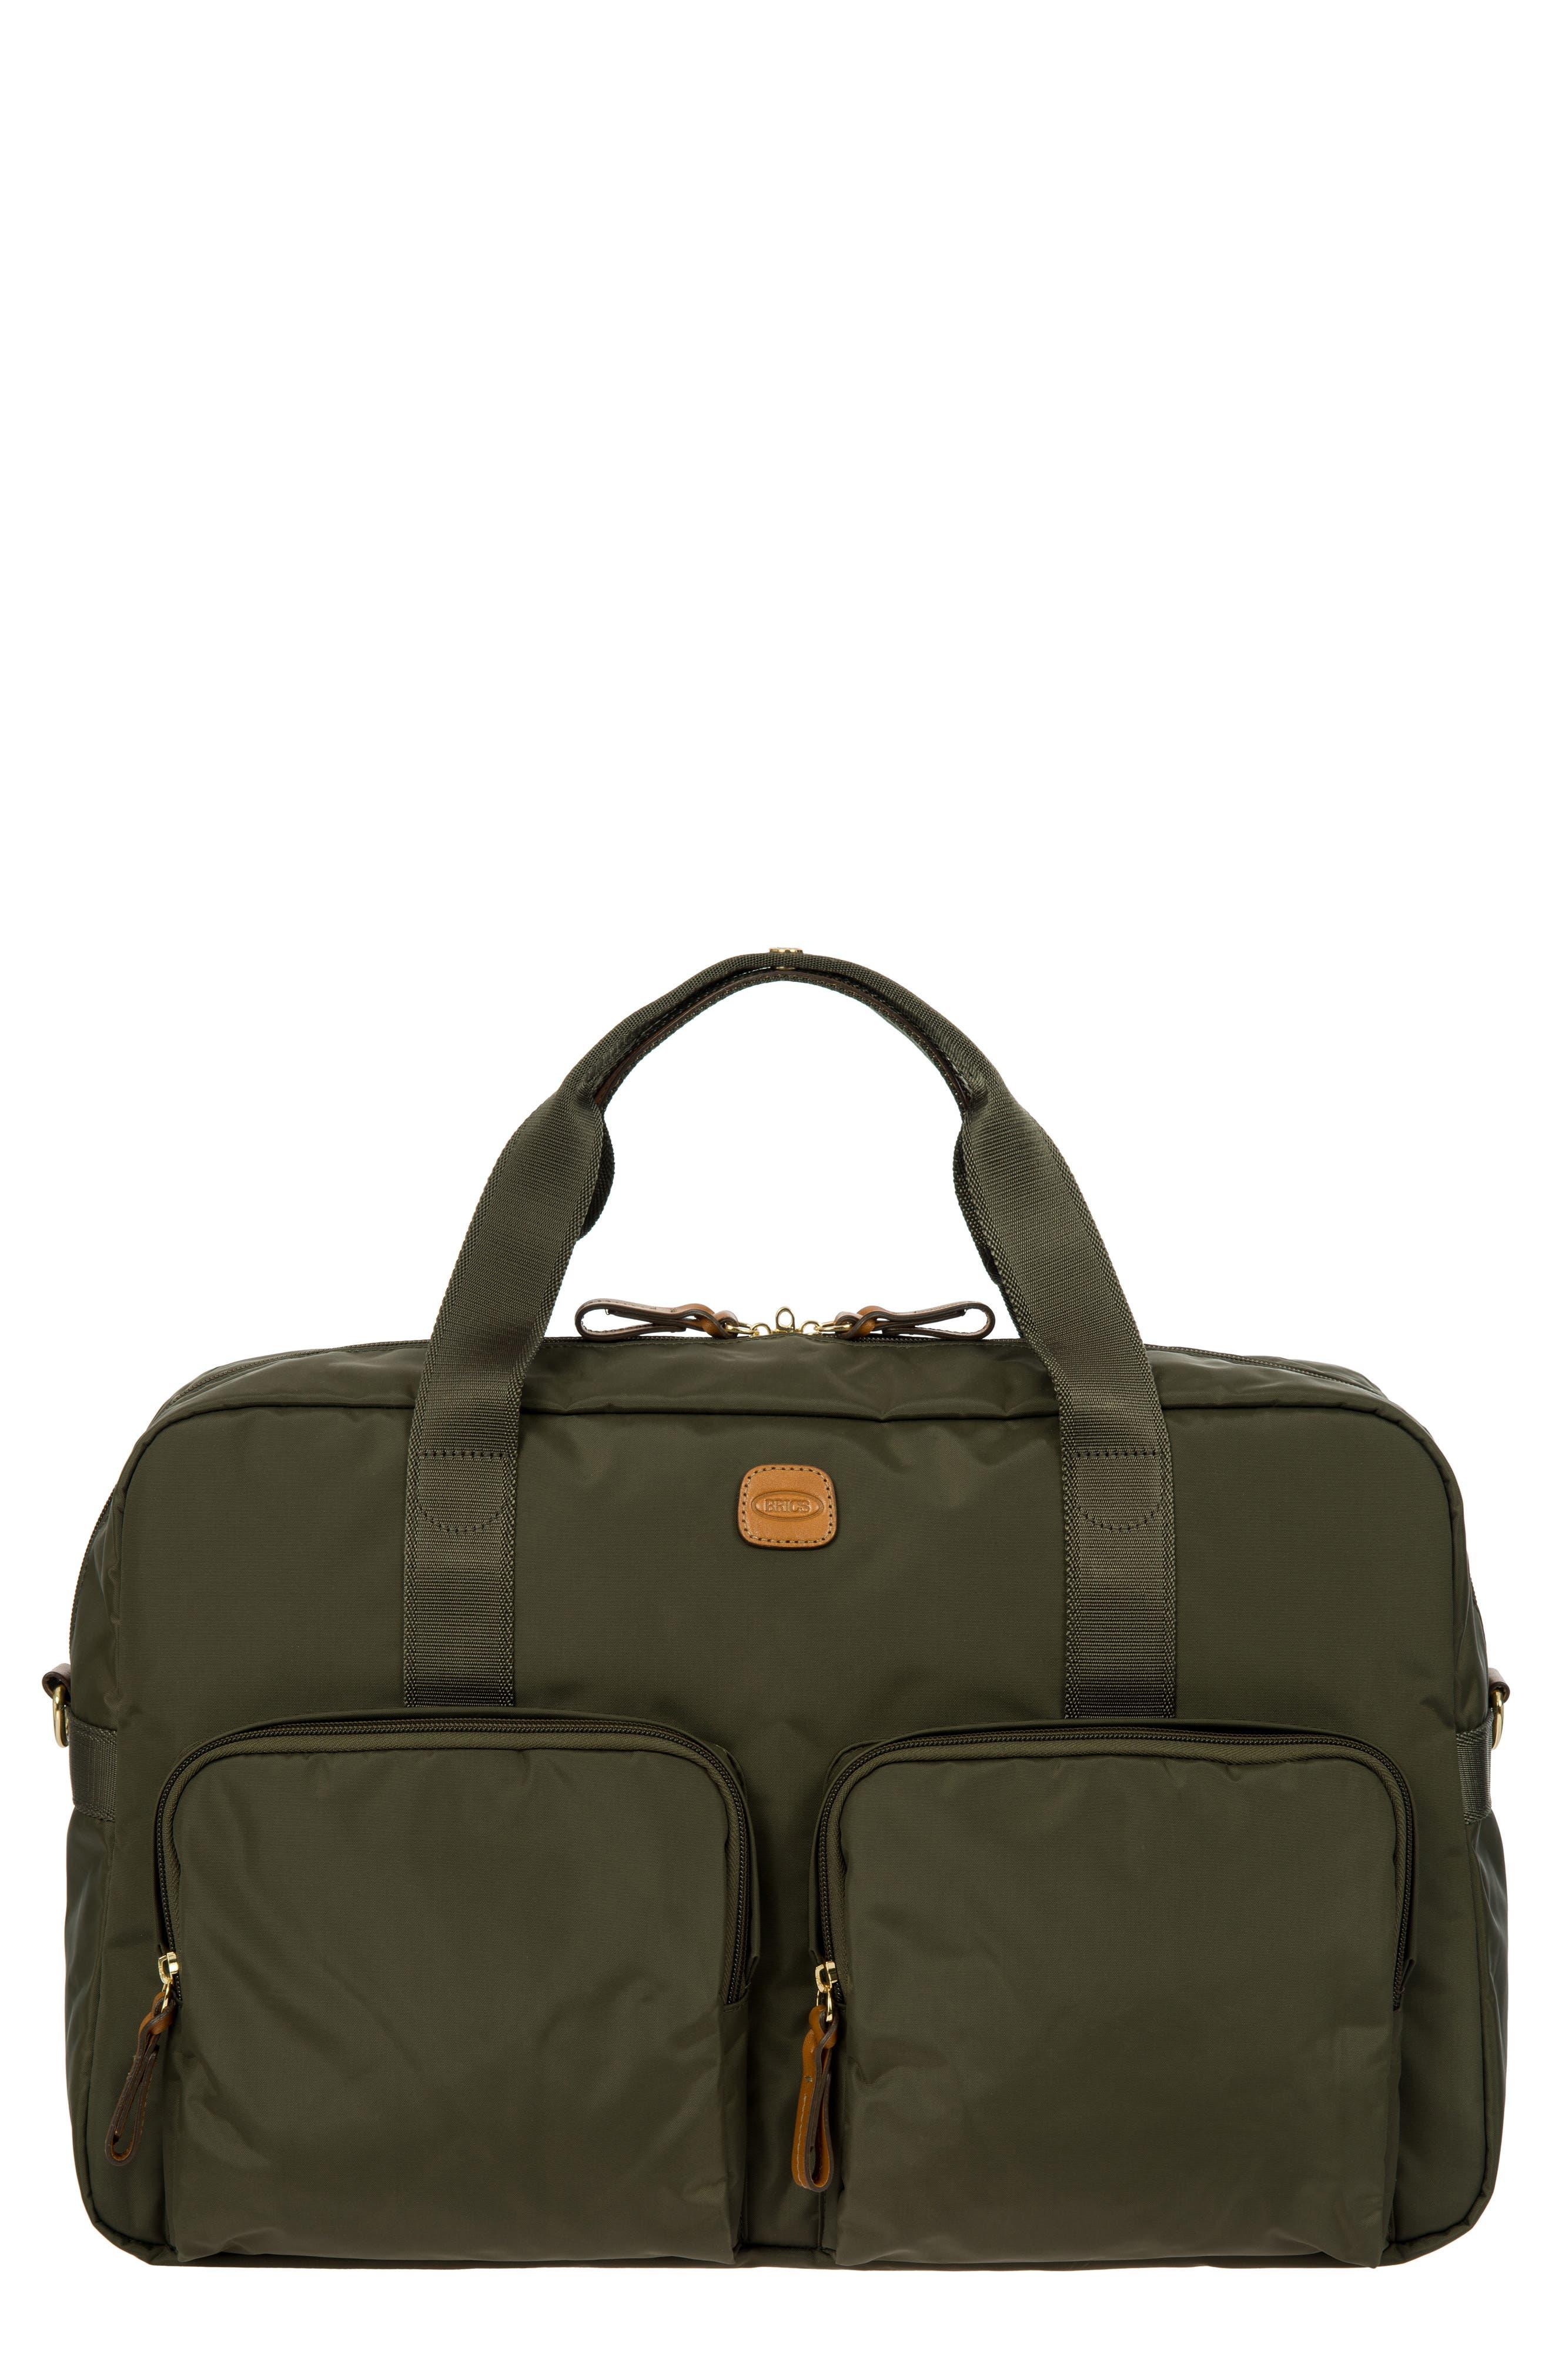 X-Bag Boarding 18-Inch Duffel Bag,                             Main thumbnail 1, color,                             OLIVE